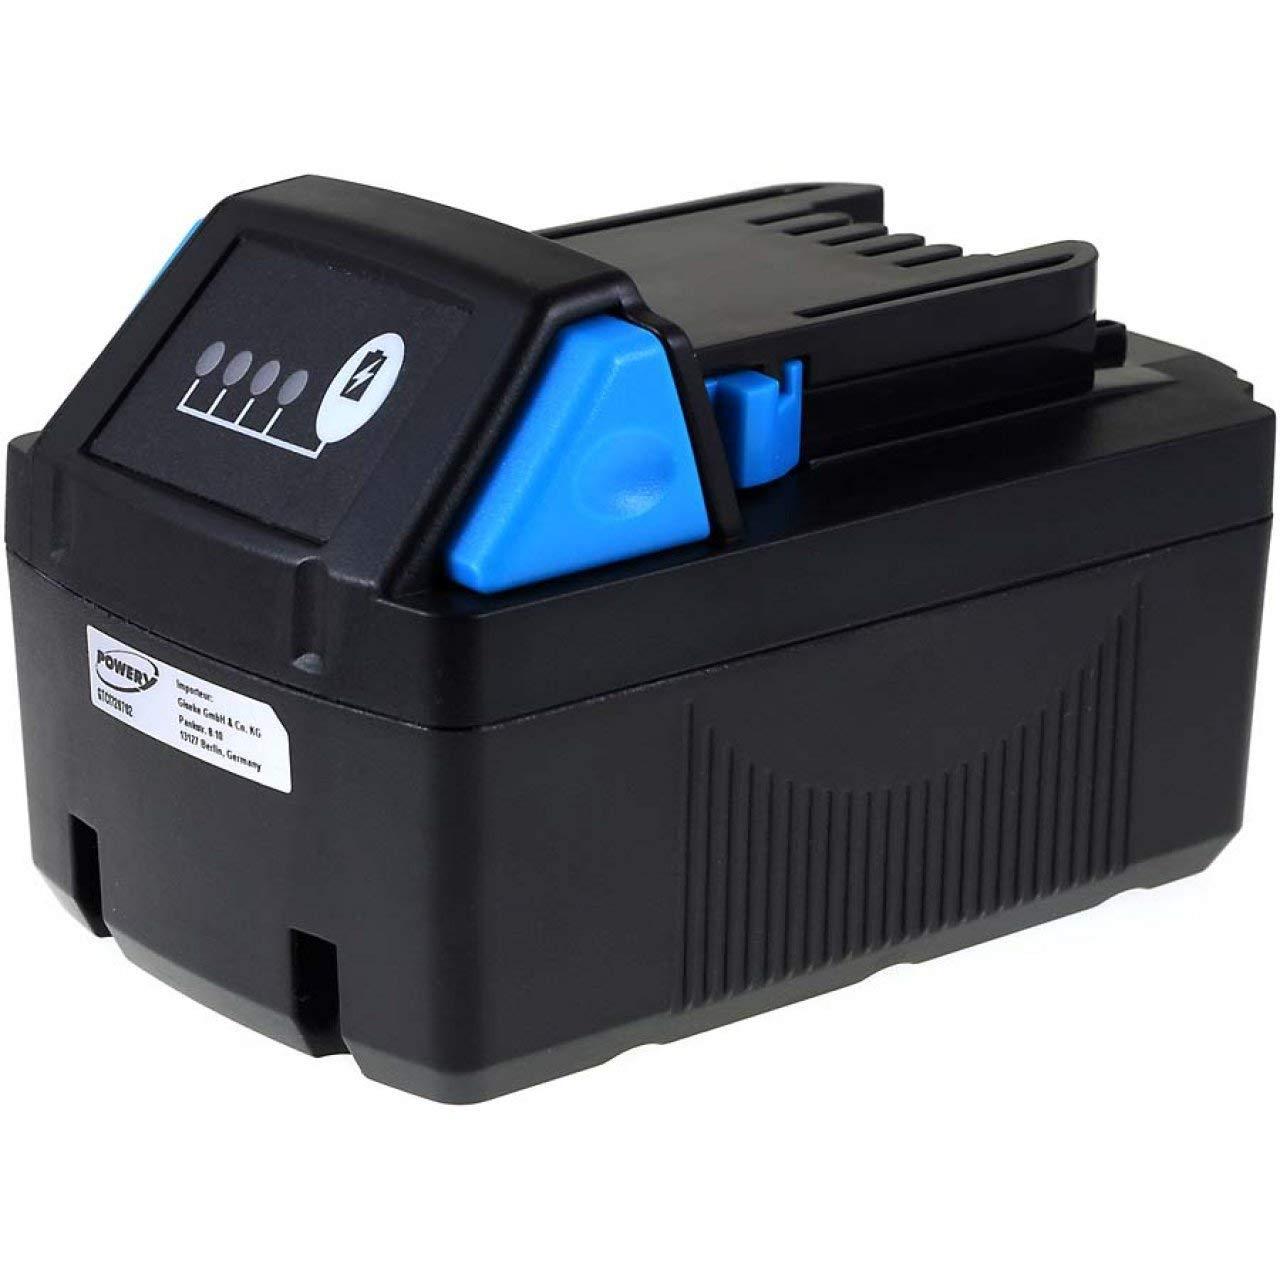 Batteria per pistola a cartucce a batteria Milwaukee C18 PCG 400 4000mAh